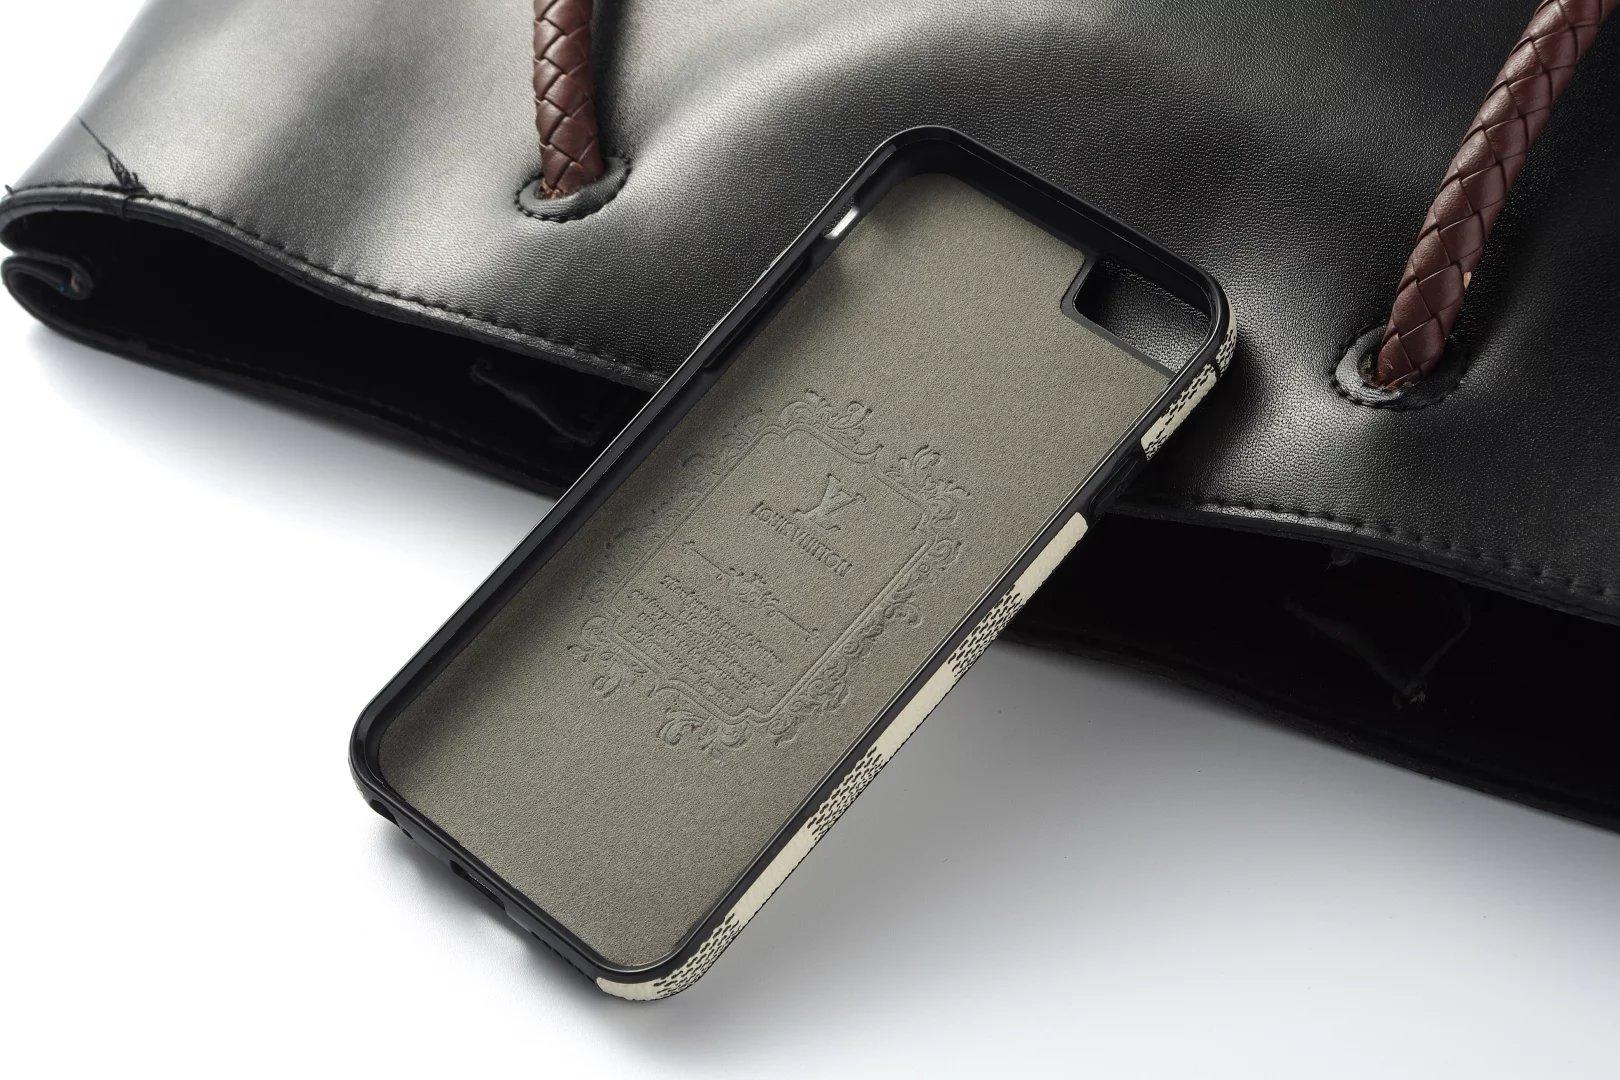 schutzhülle iphone iphone hülle bedrucken lassen günstig Louis Vuitton iphone 8 hüllen ipad mini hülle 8lbst gestalten preis für iphone 8 freitag iphone 8 hülle lederetui iphone 8 holz cover iphone 8 iphone 8hülle